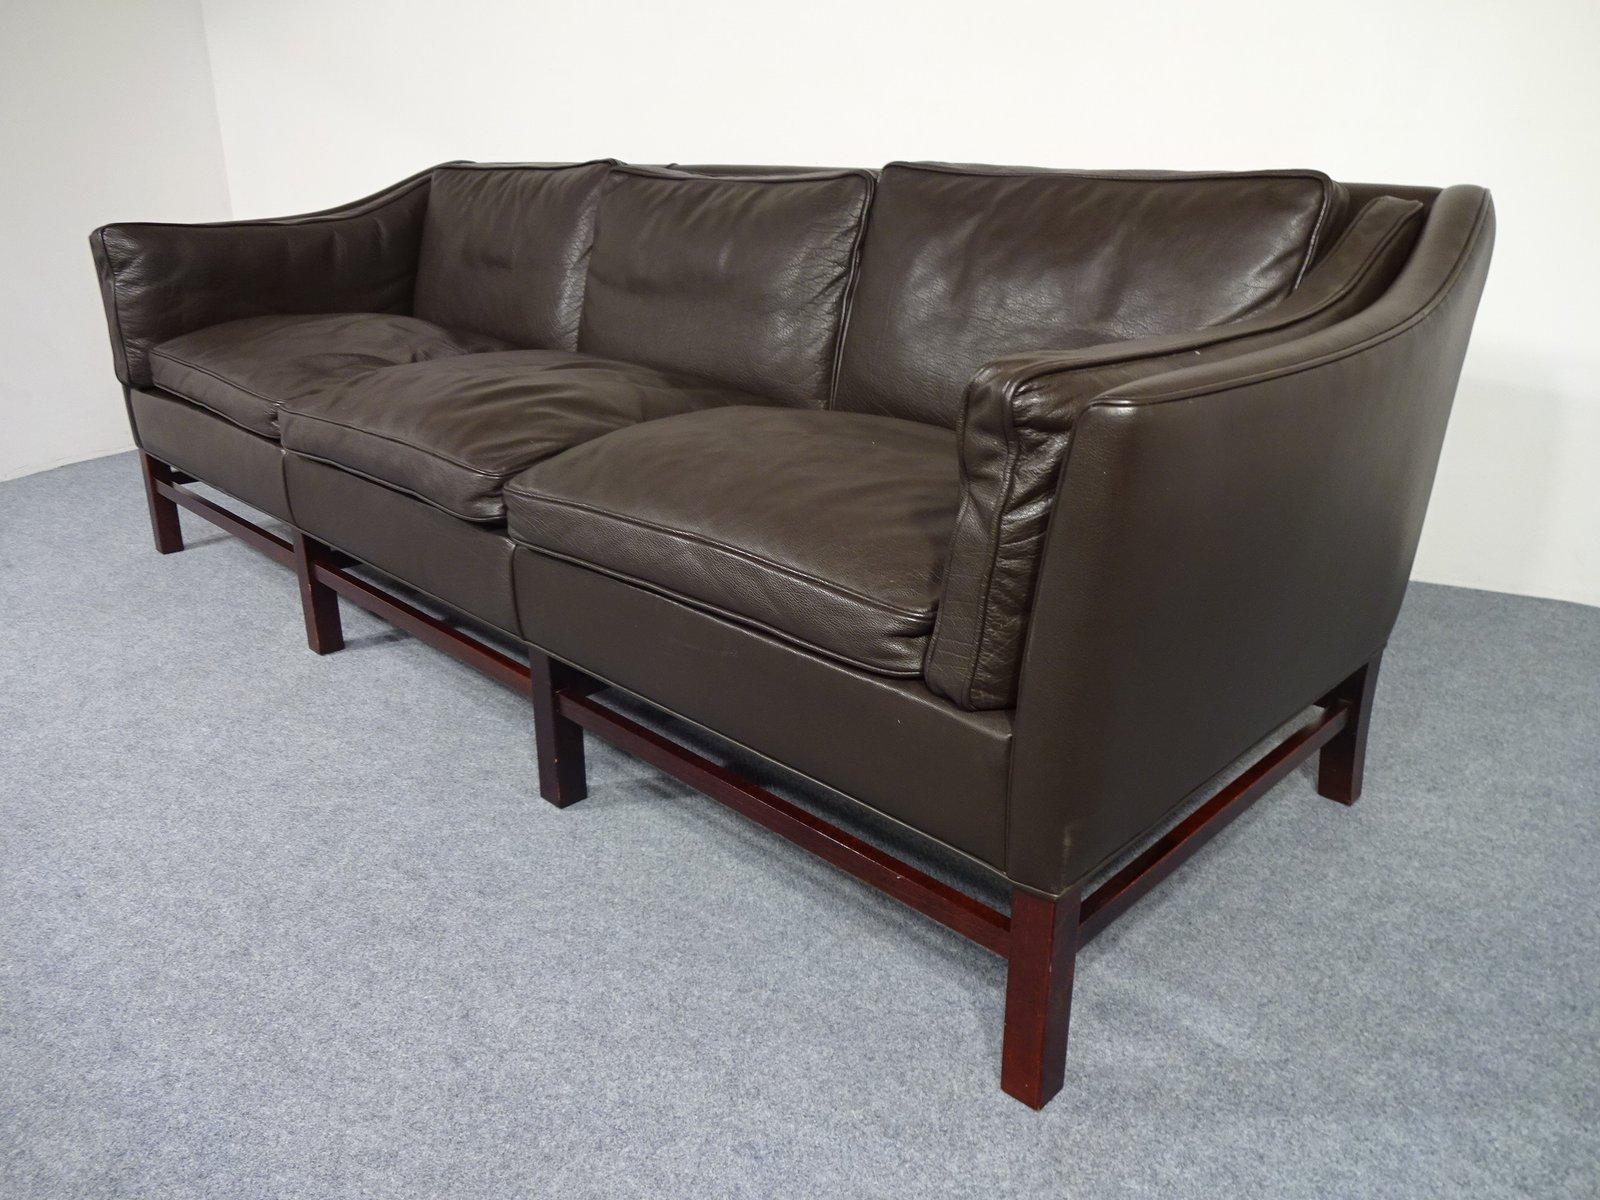 vintage leather sofa for sale